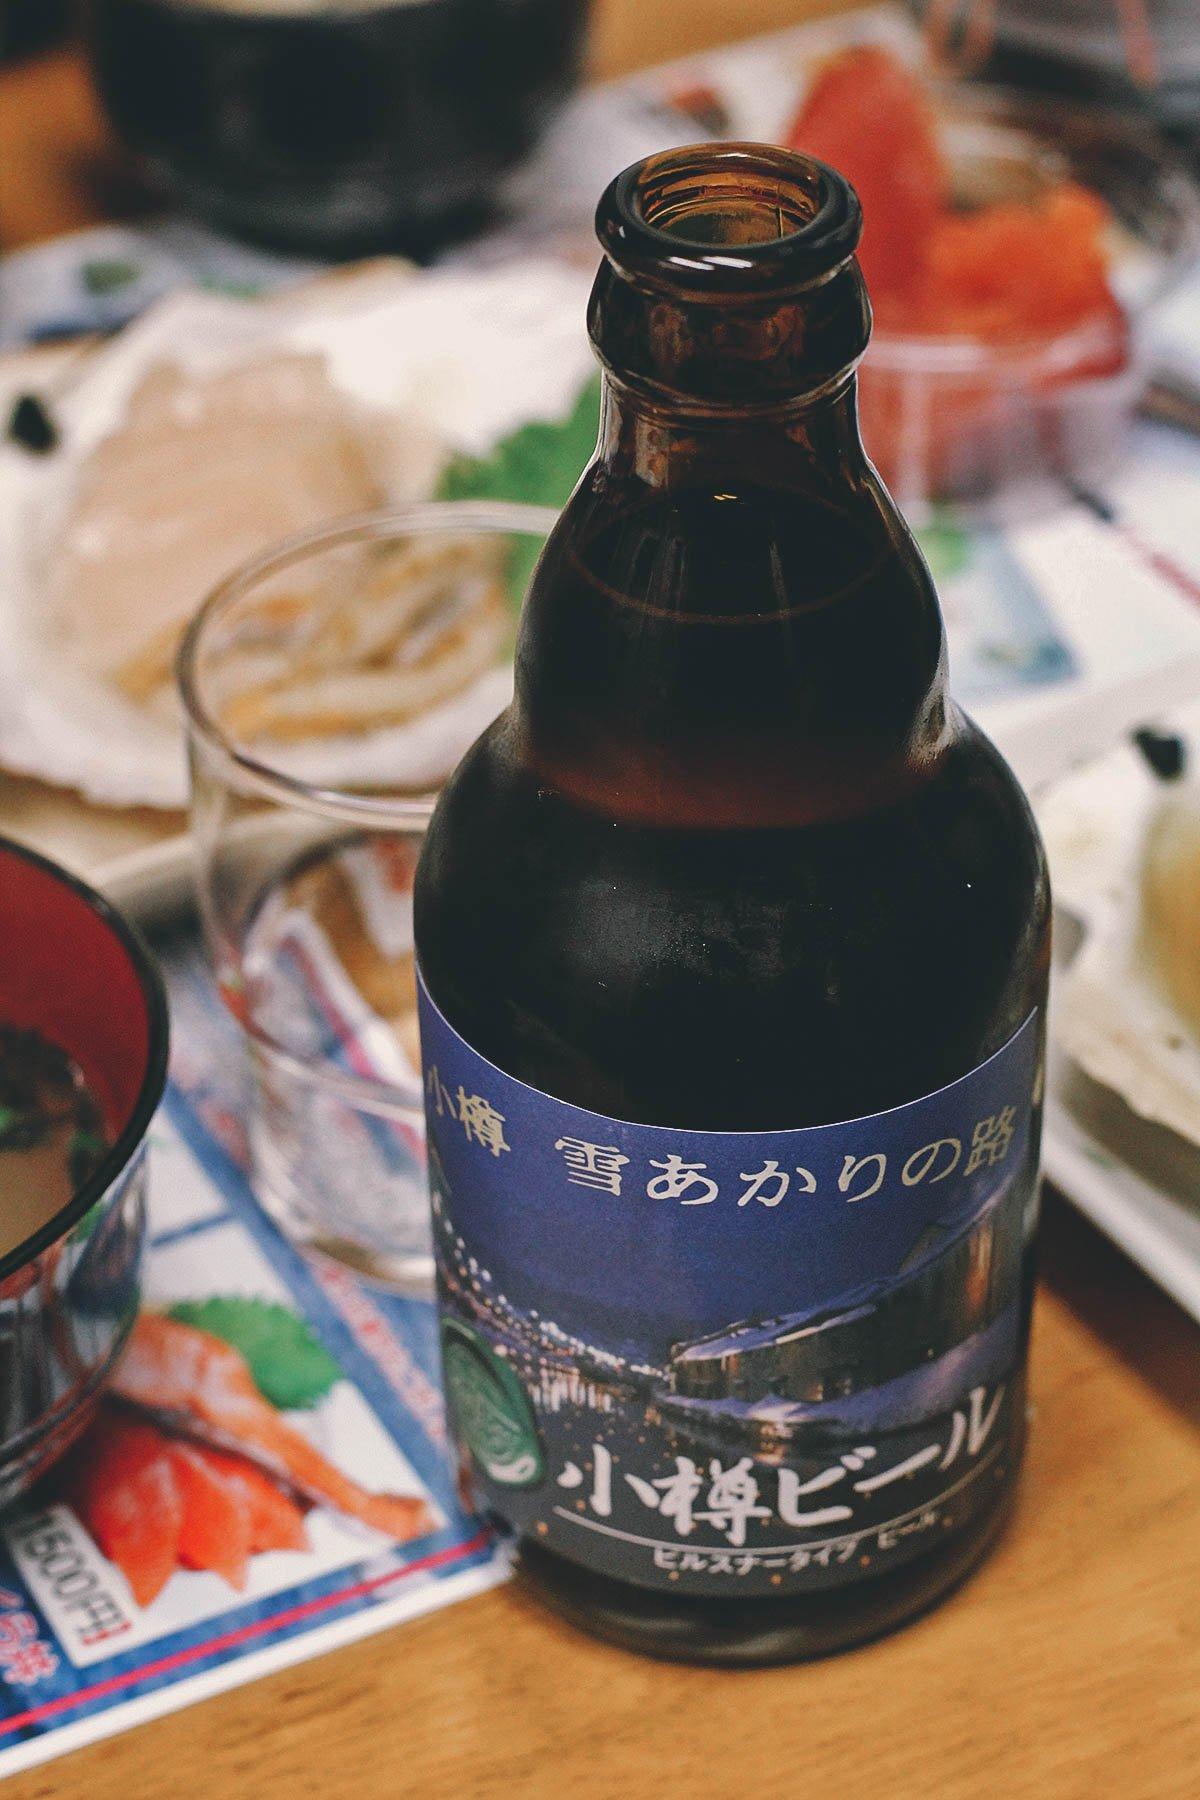 Takinami Shokudo: Where to Have Overflowing Bowls of Kaisendon in Otaru, Japan